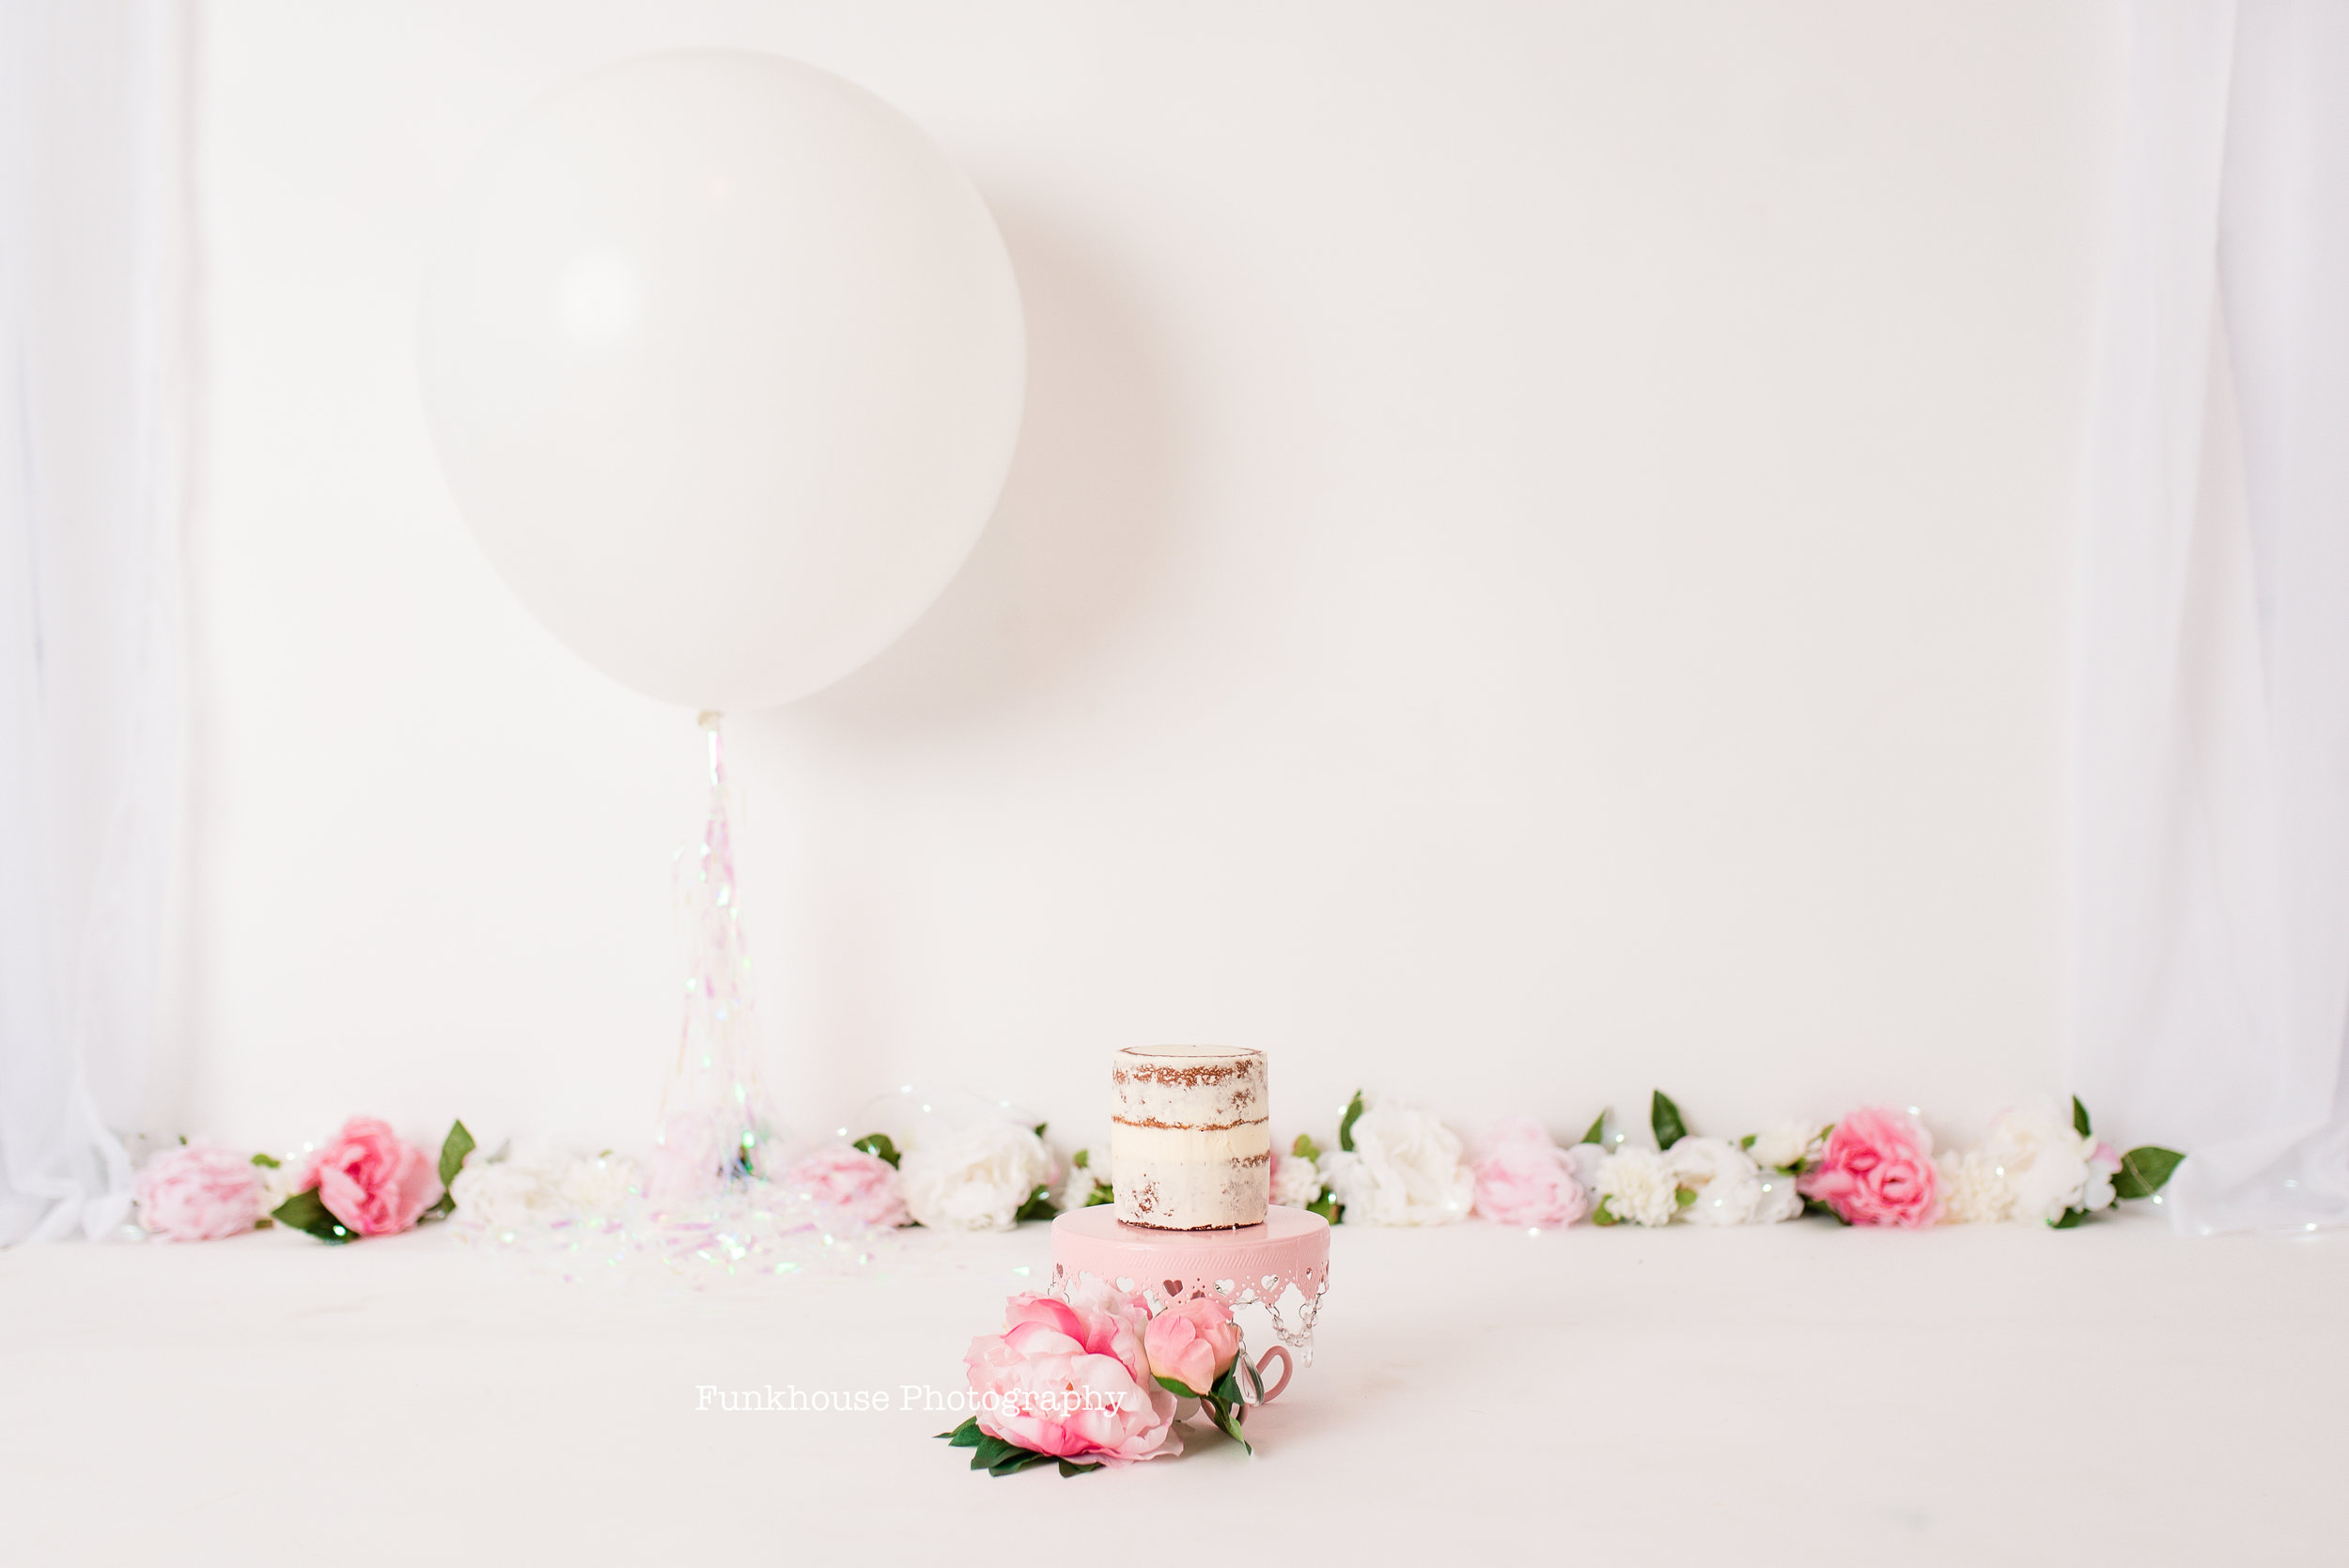 pink cake flowers fb 2.jpg